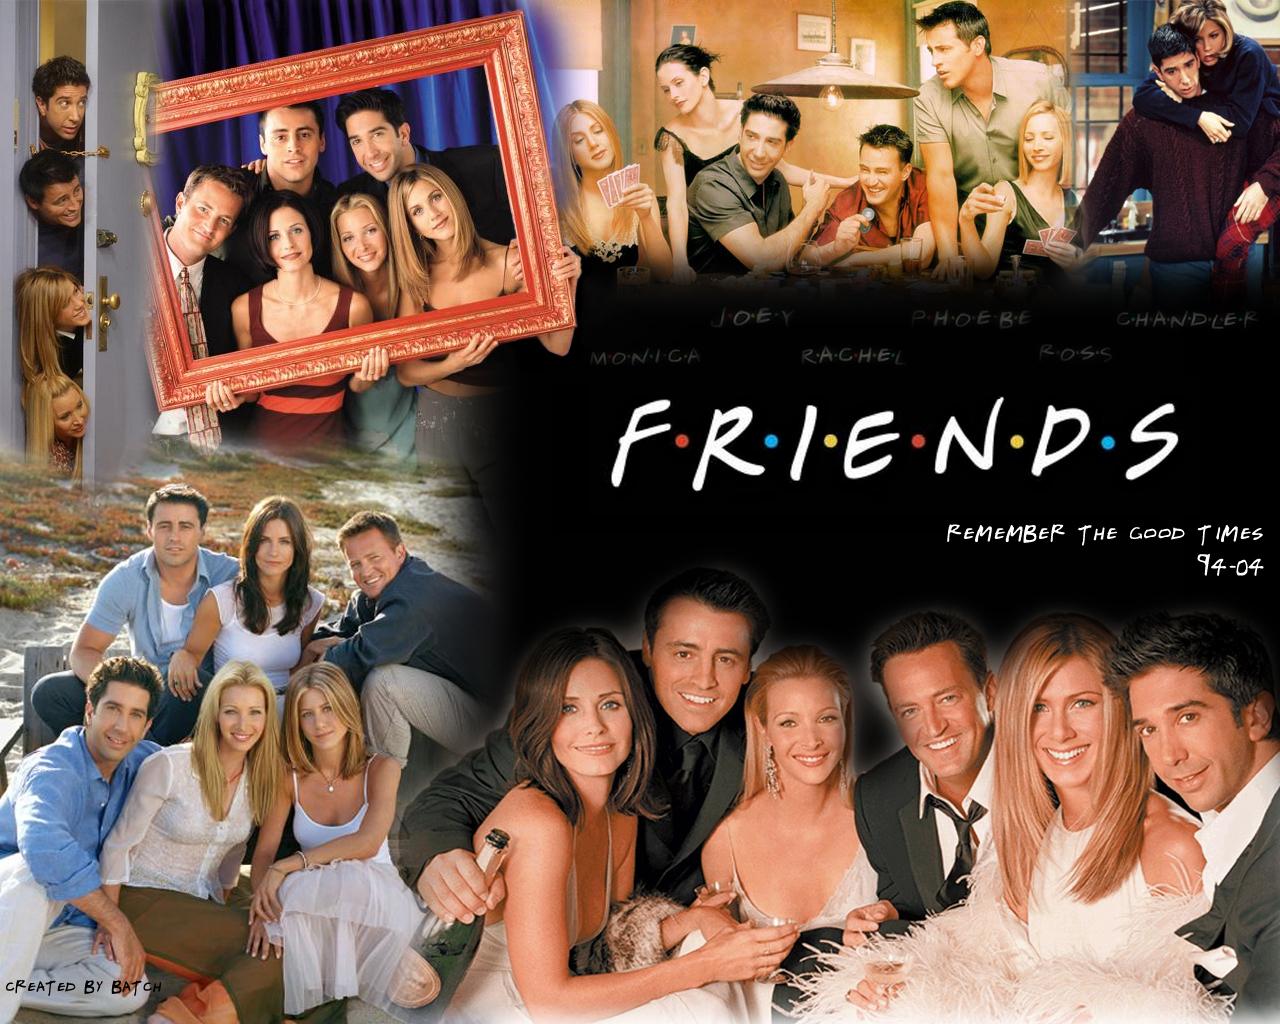 Free Desktop Wallpaper Amaze Your Friends: Free Download Friends Wallpaper [1280x1024] For Your